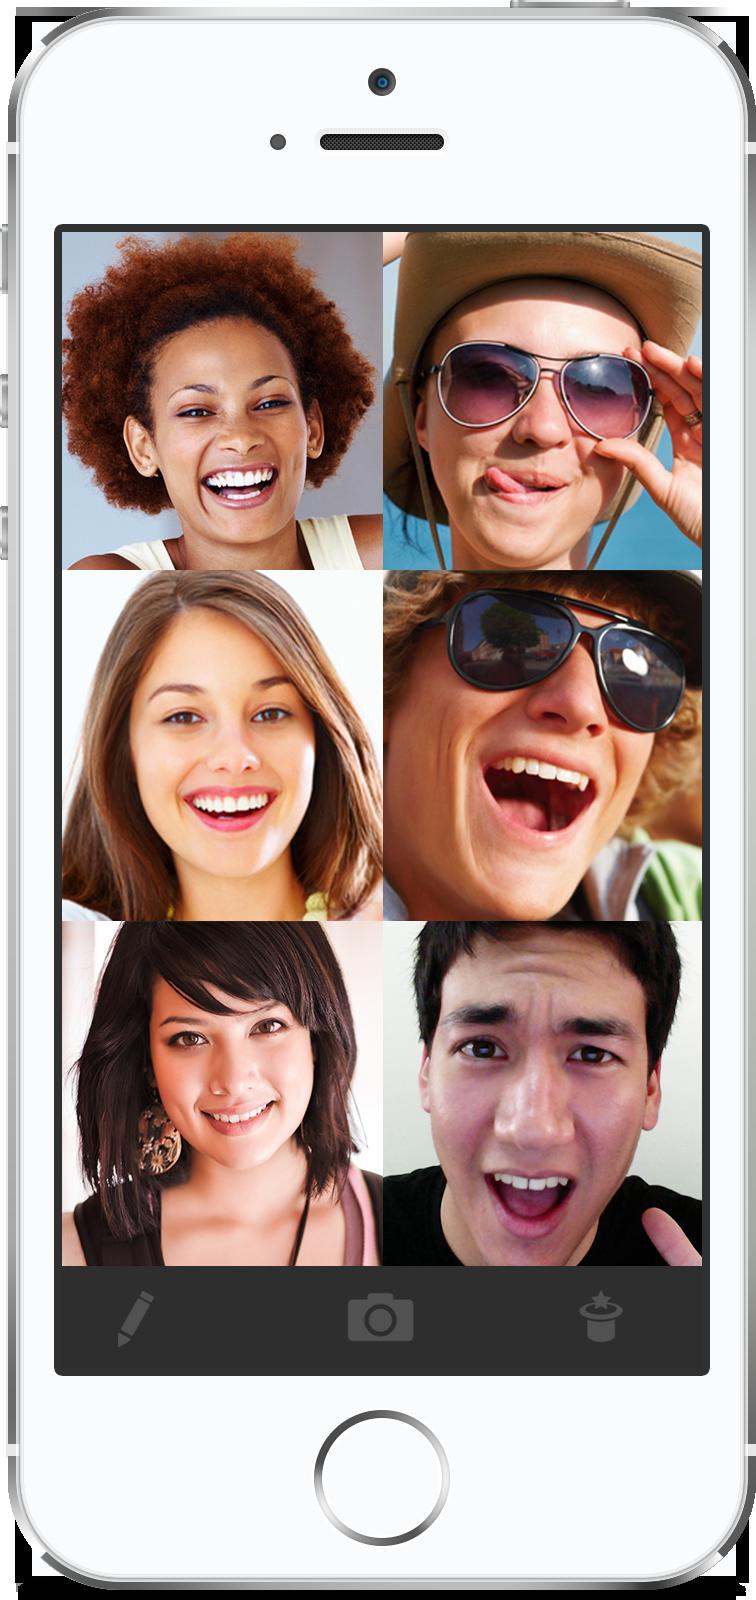 Rounds iPhone app